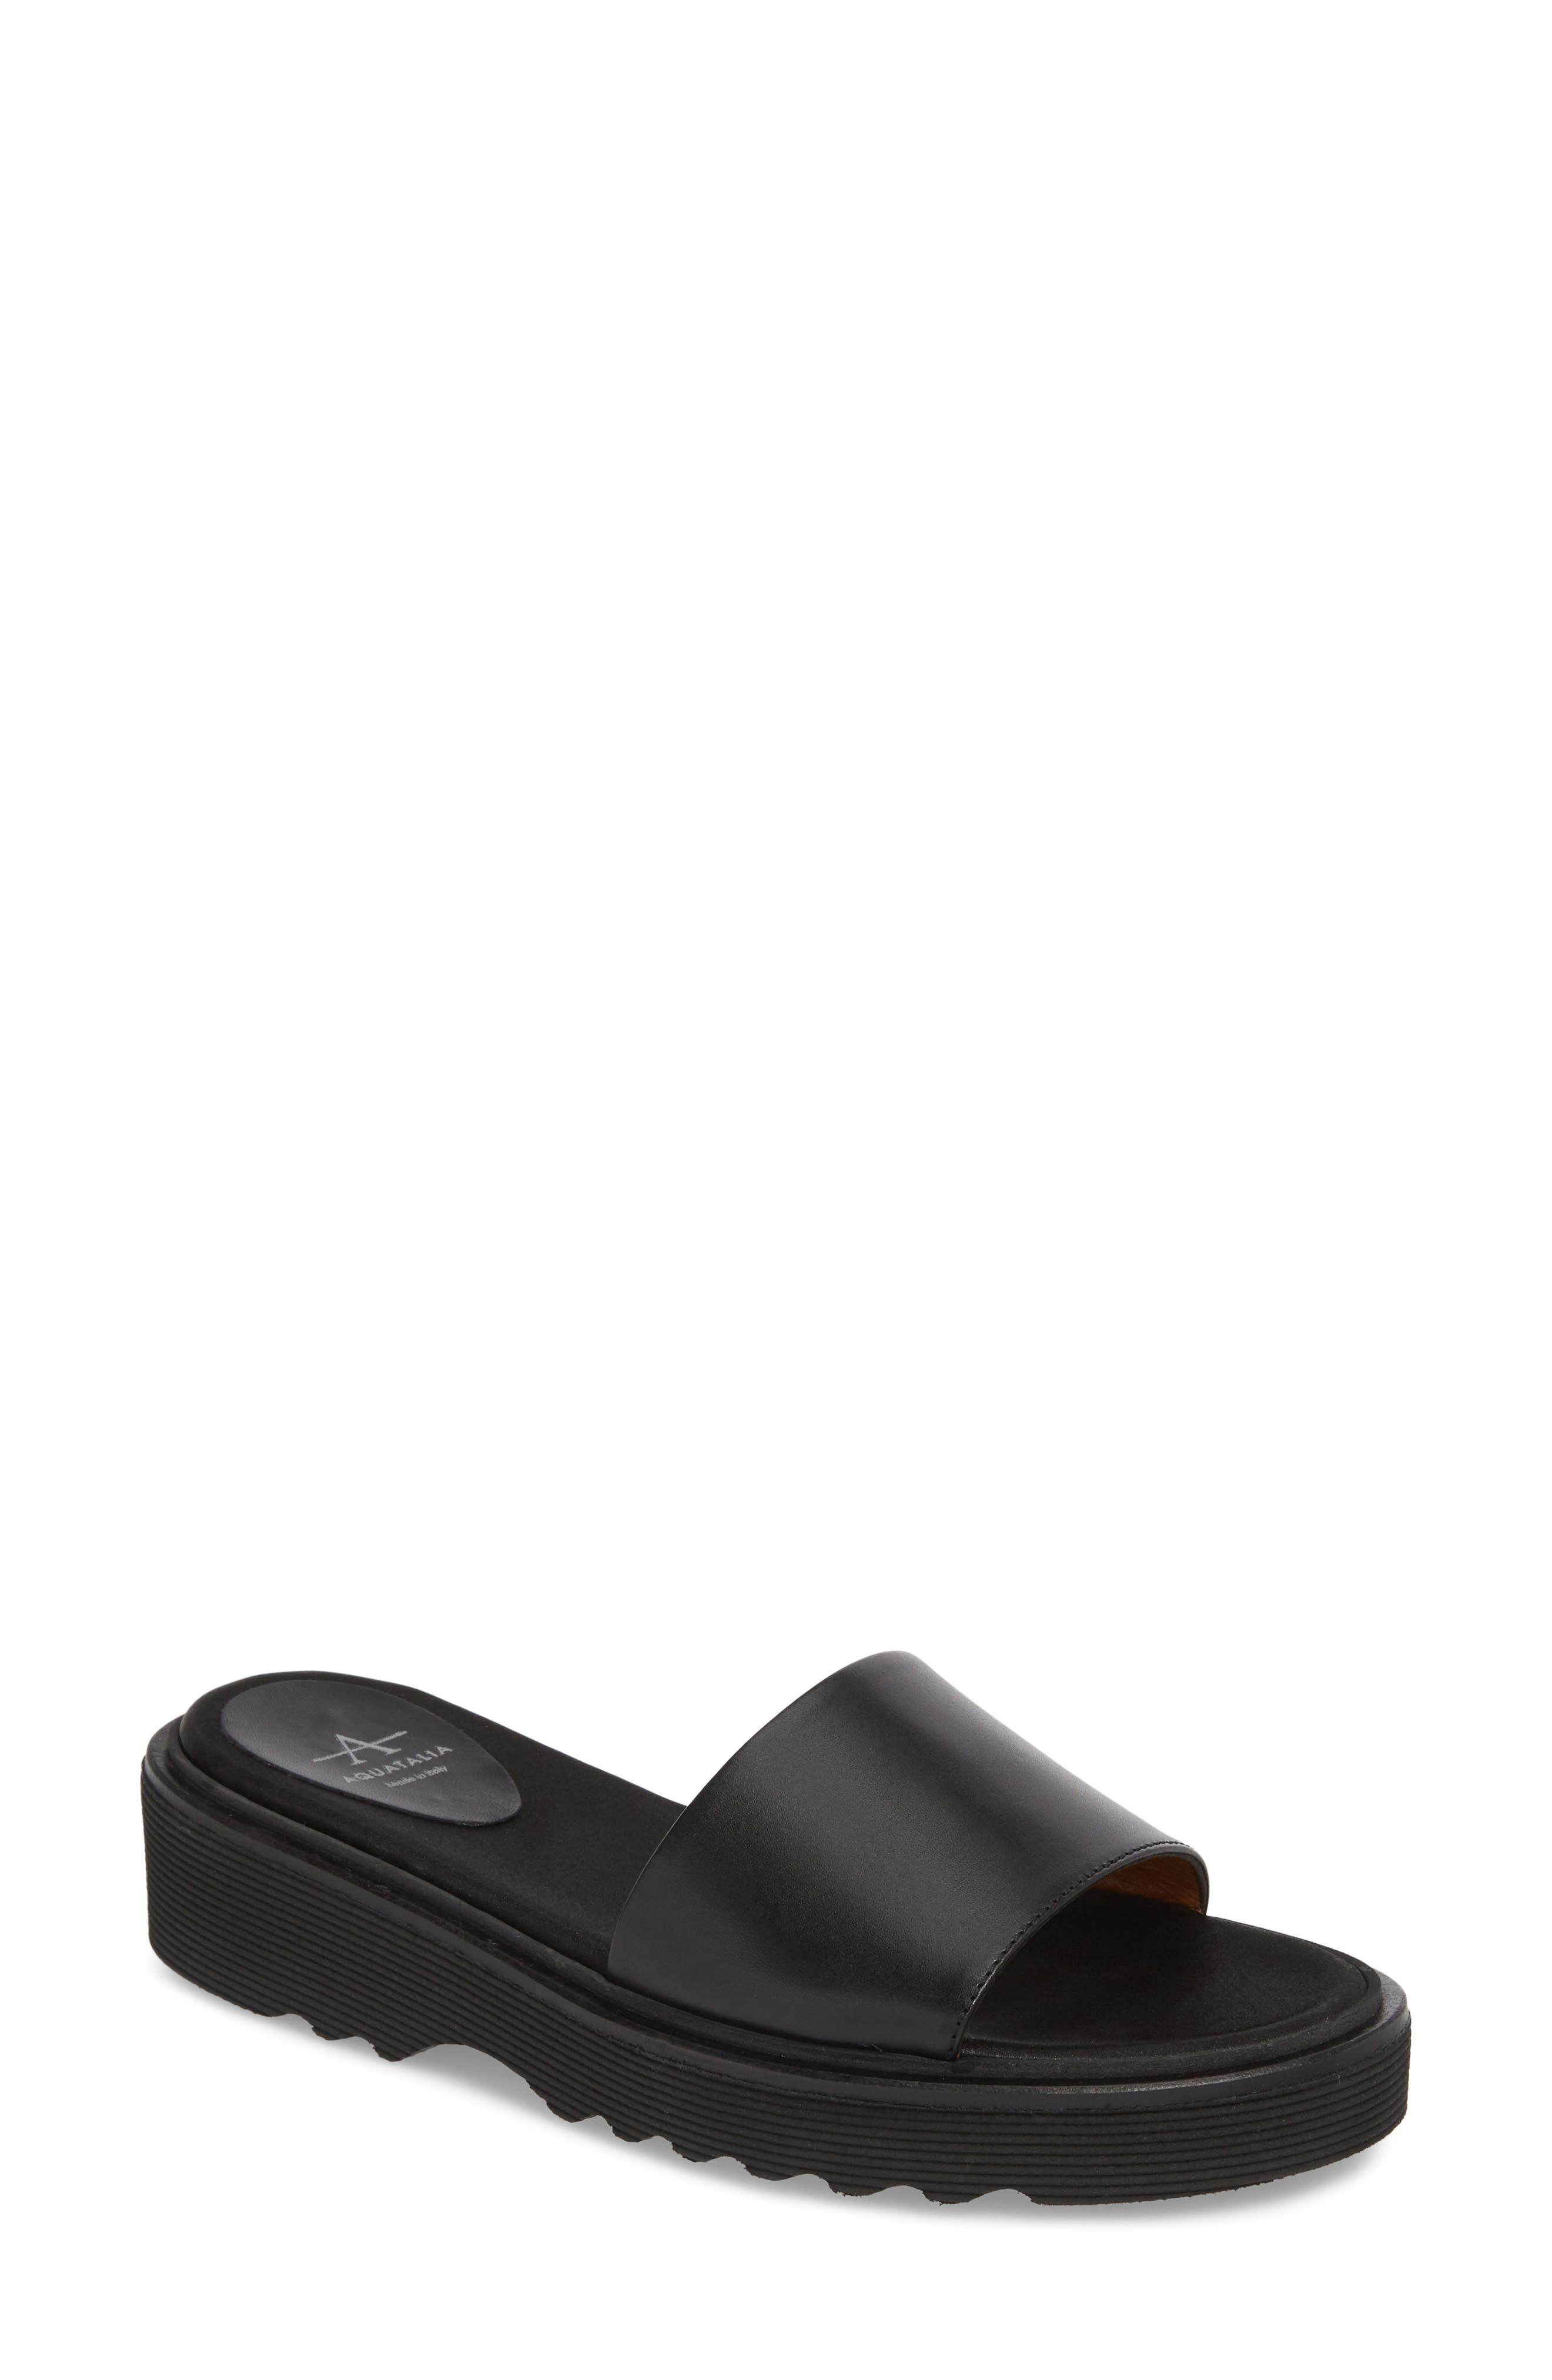 Aquatalia Willah Slide Sandal (Women)